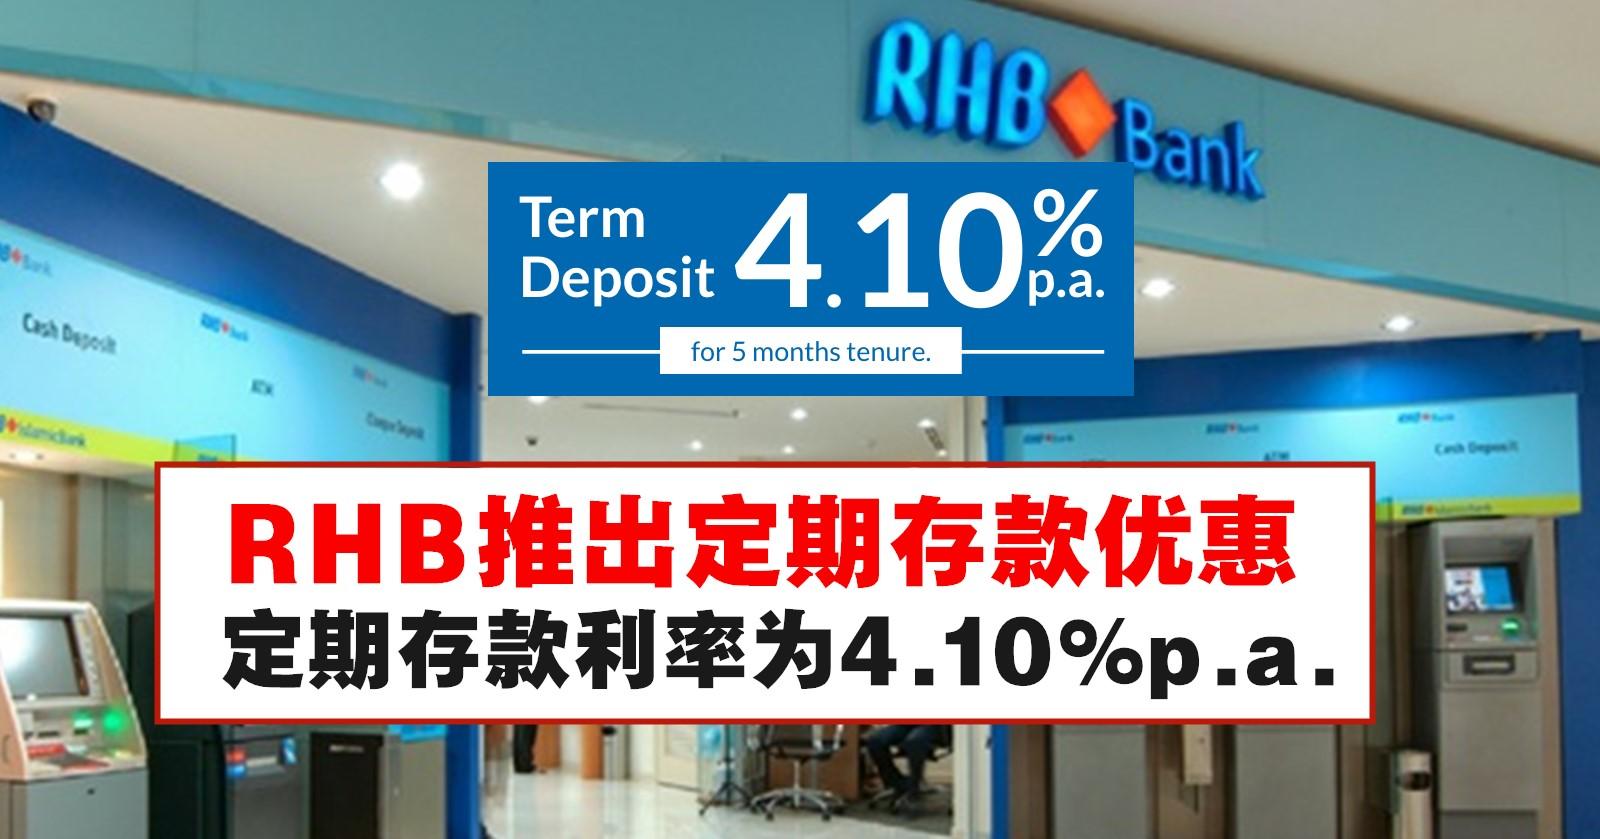 RHB推出定期存款联合储蓄/来往户口优惠